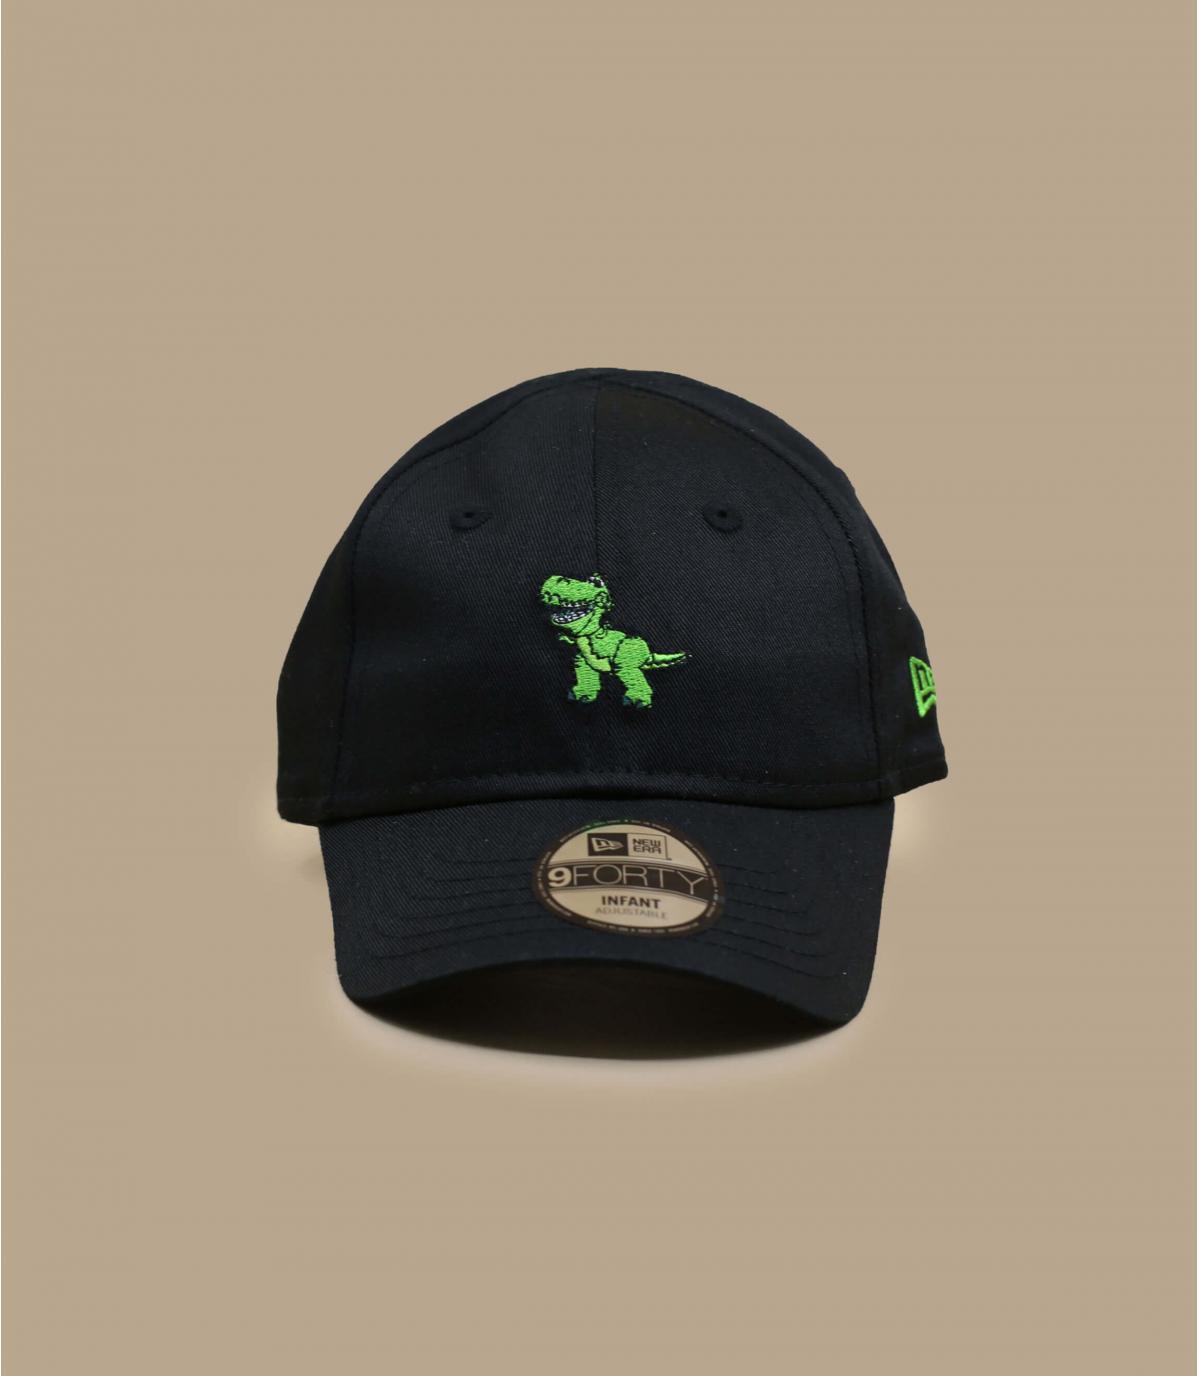 Toy Story Rex baby cap